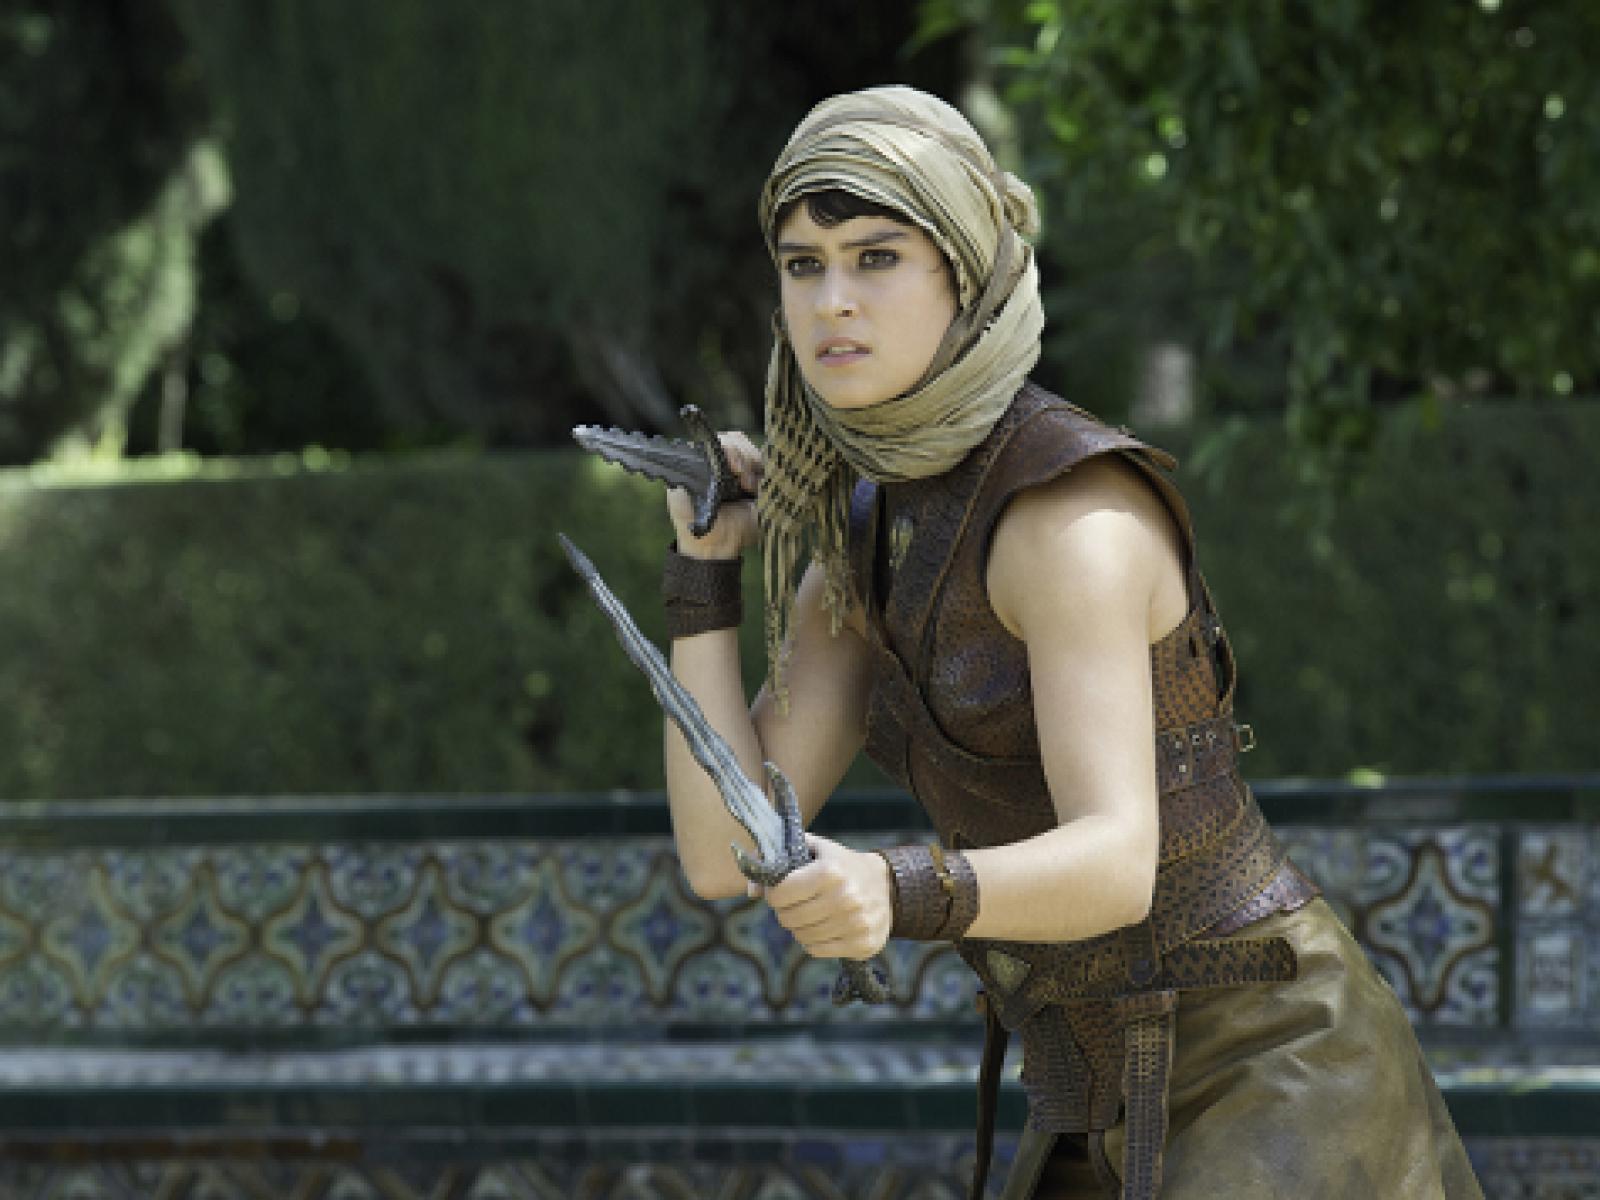 Get Jory Game Of Thrones Actor JPG